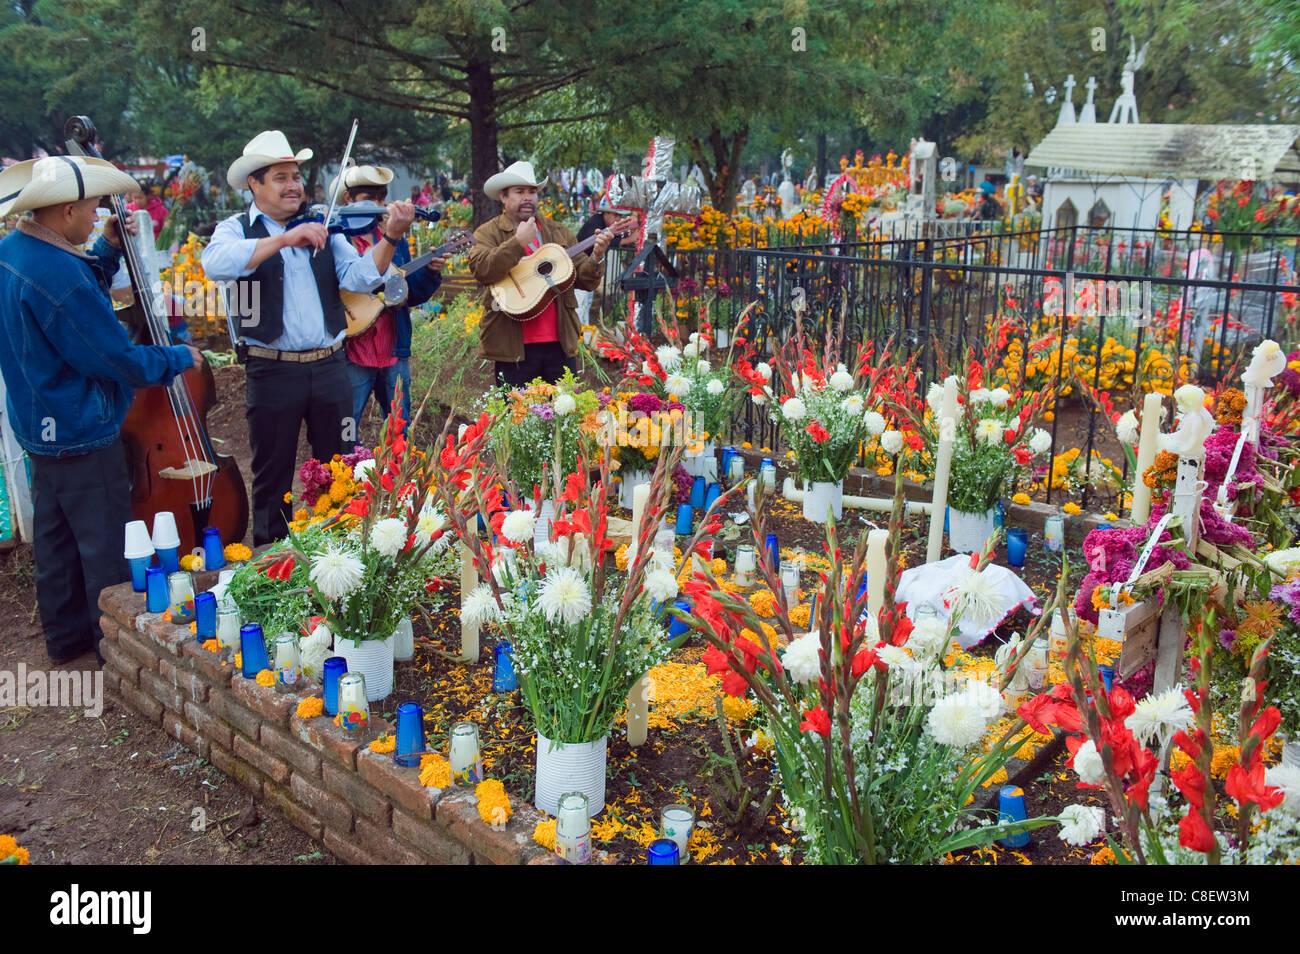 Mariachi group at grave, Dia de Muertos (Day of the Dead) celebrations Tzintzuntzan, Lago de Patzcuaro, Michoacan - Stock Image